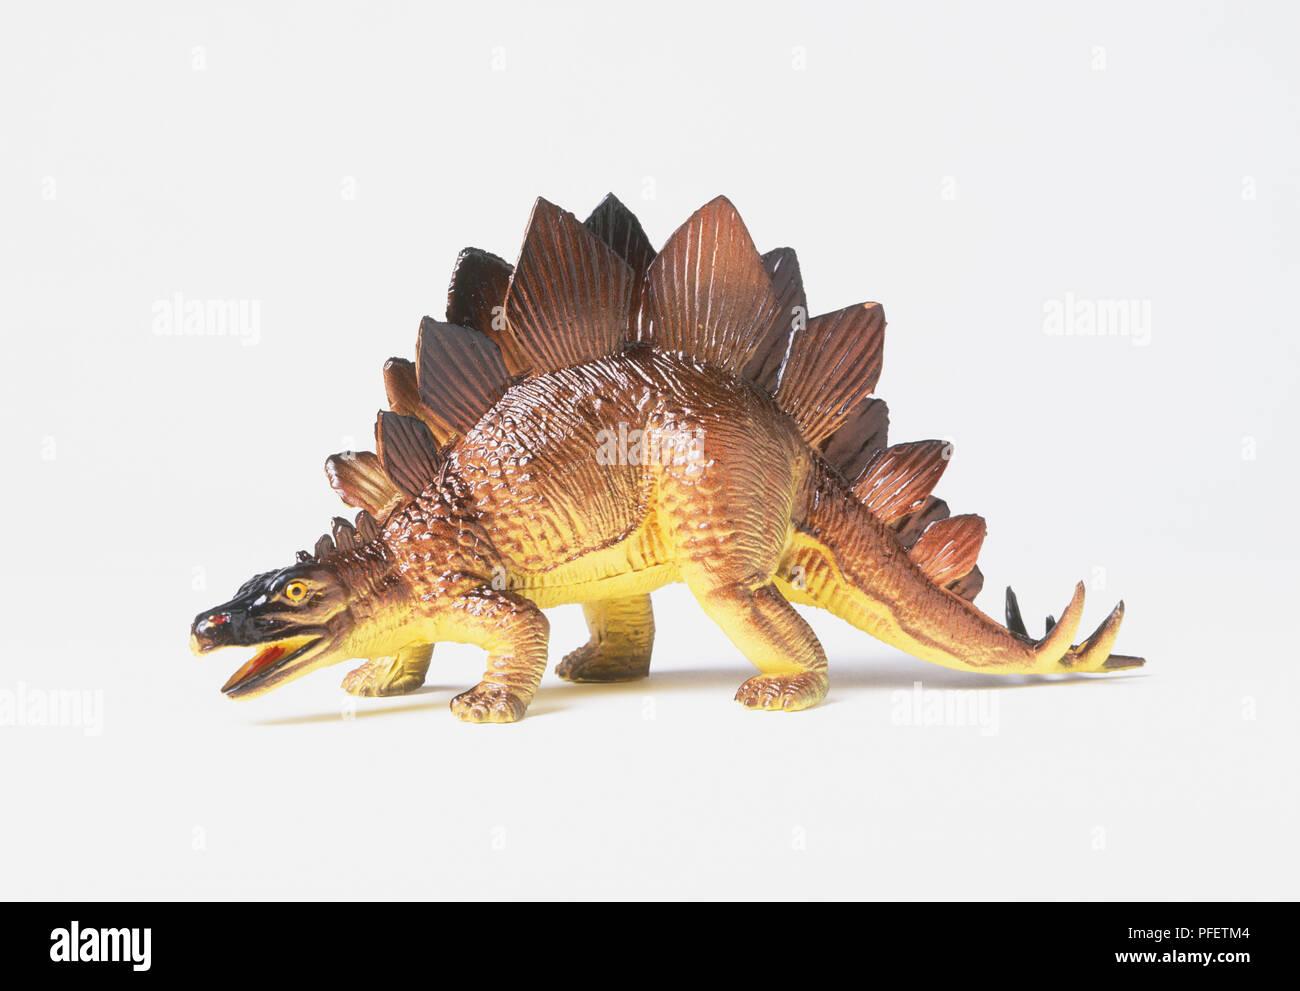 Model of a Stegosaurus - Stock Image